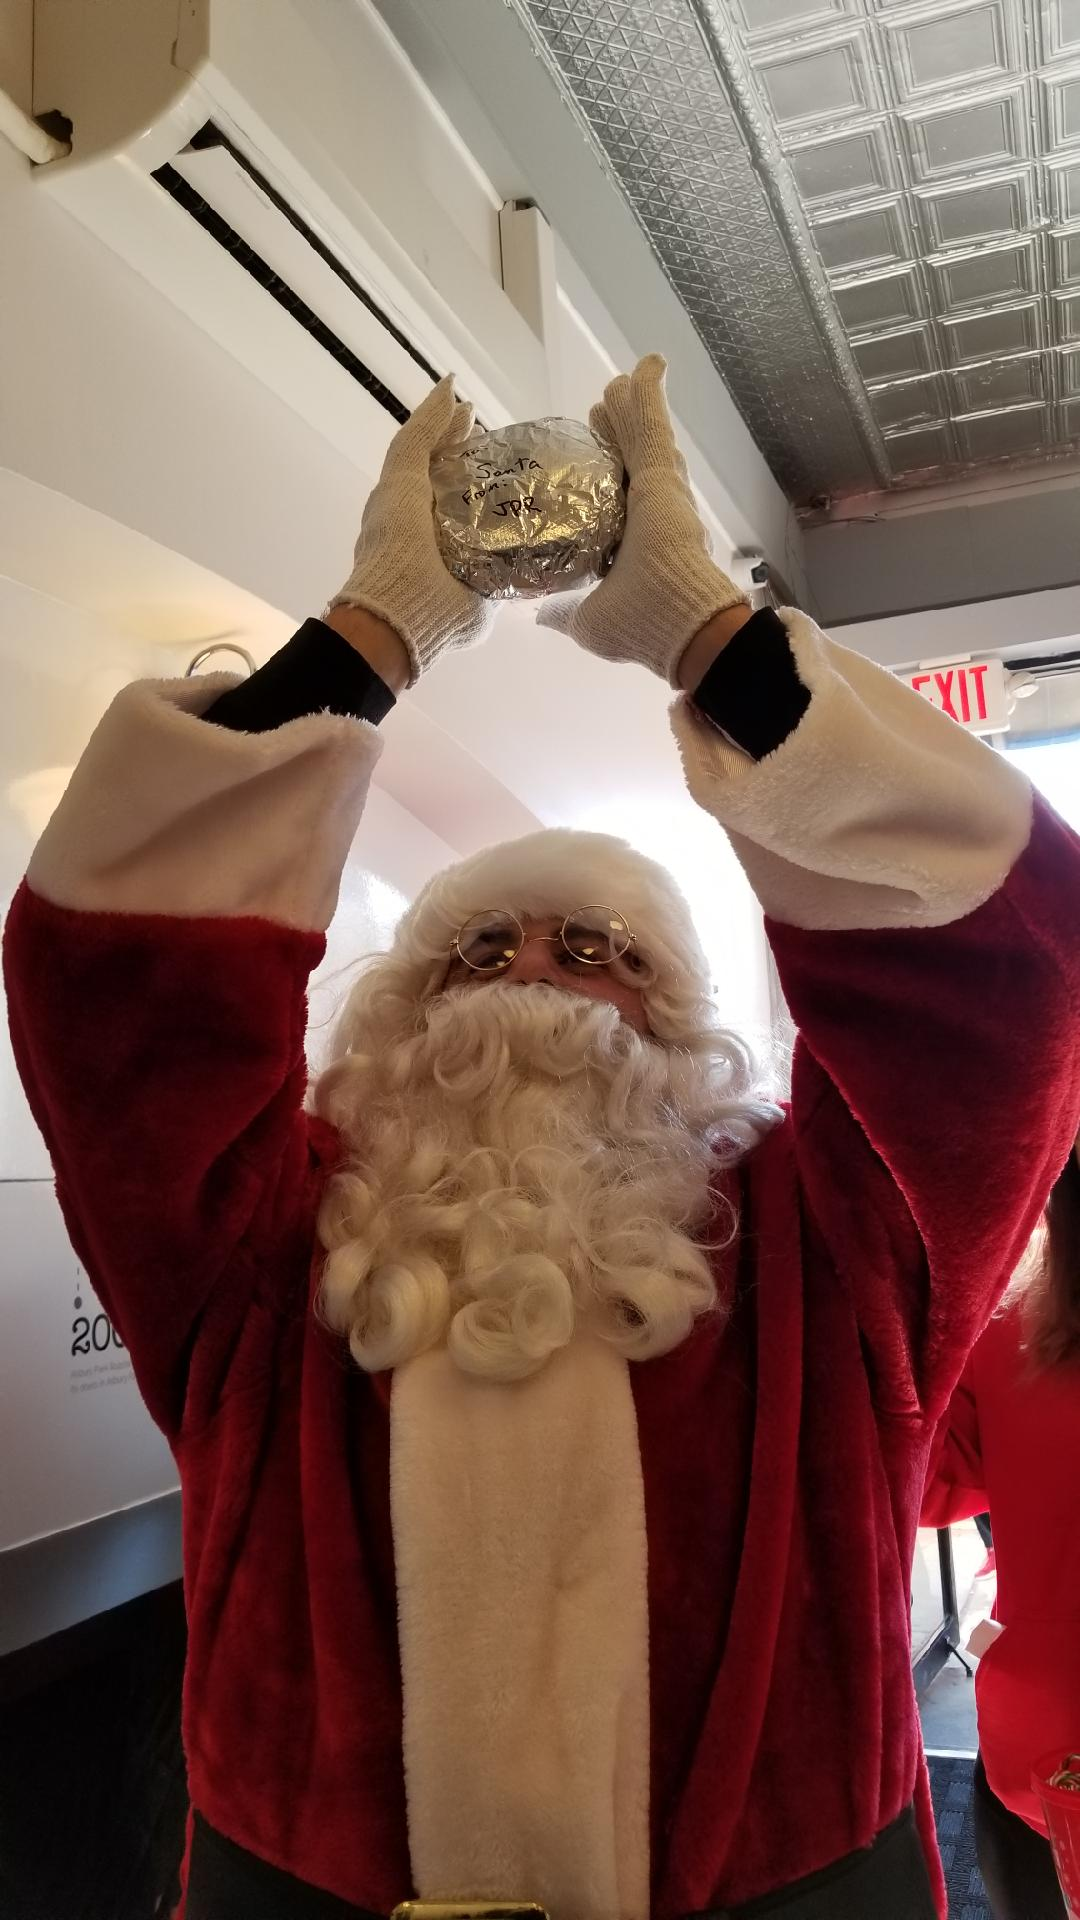 HO! HO! HO! - Thanks for the visit Santa! #NavesinkHook&Ladder